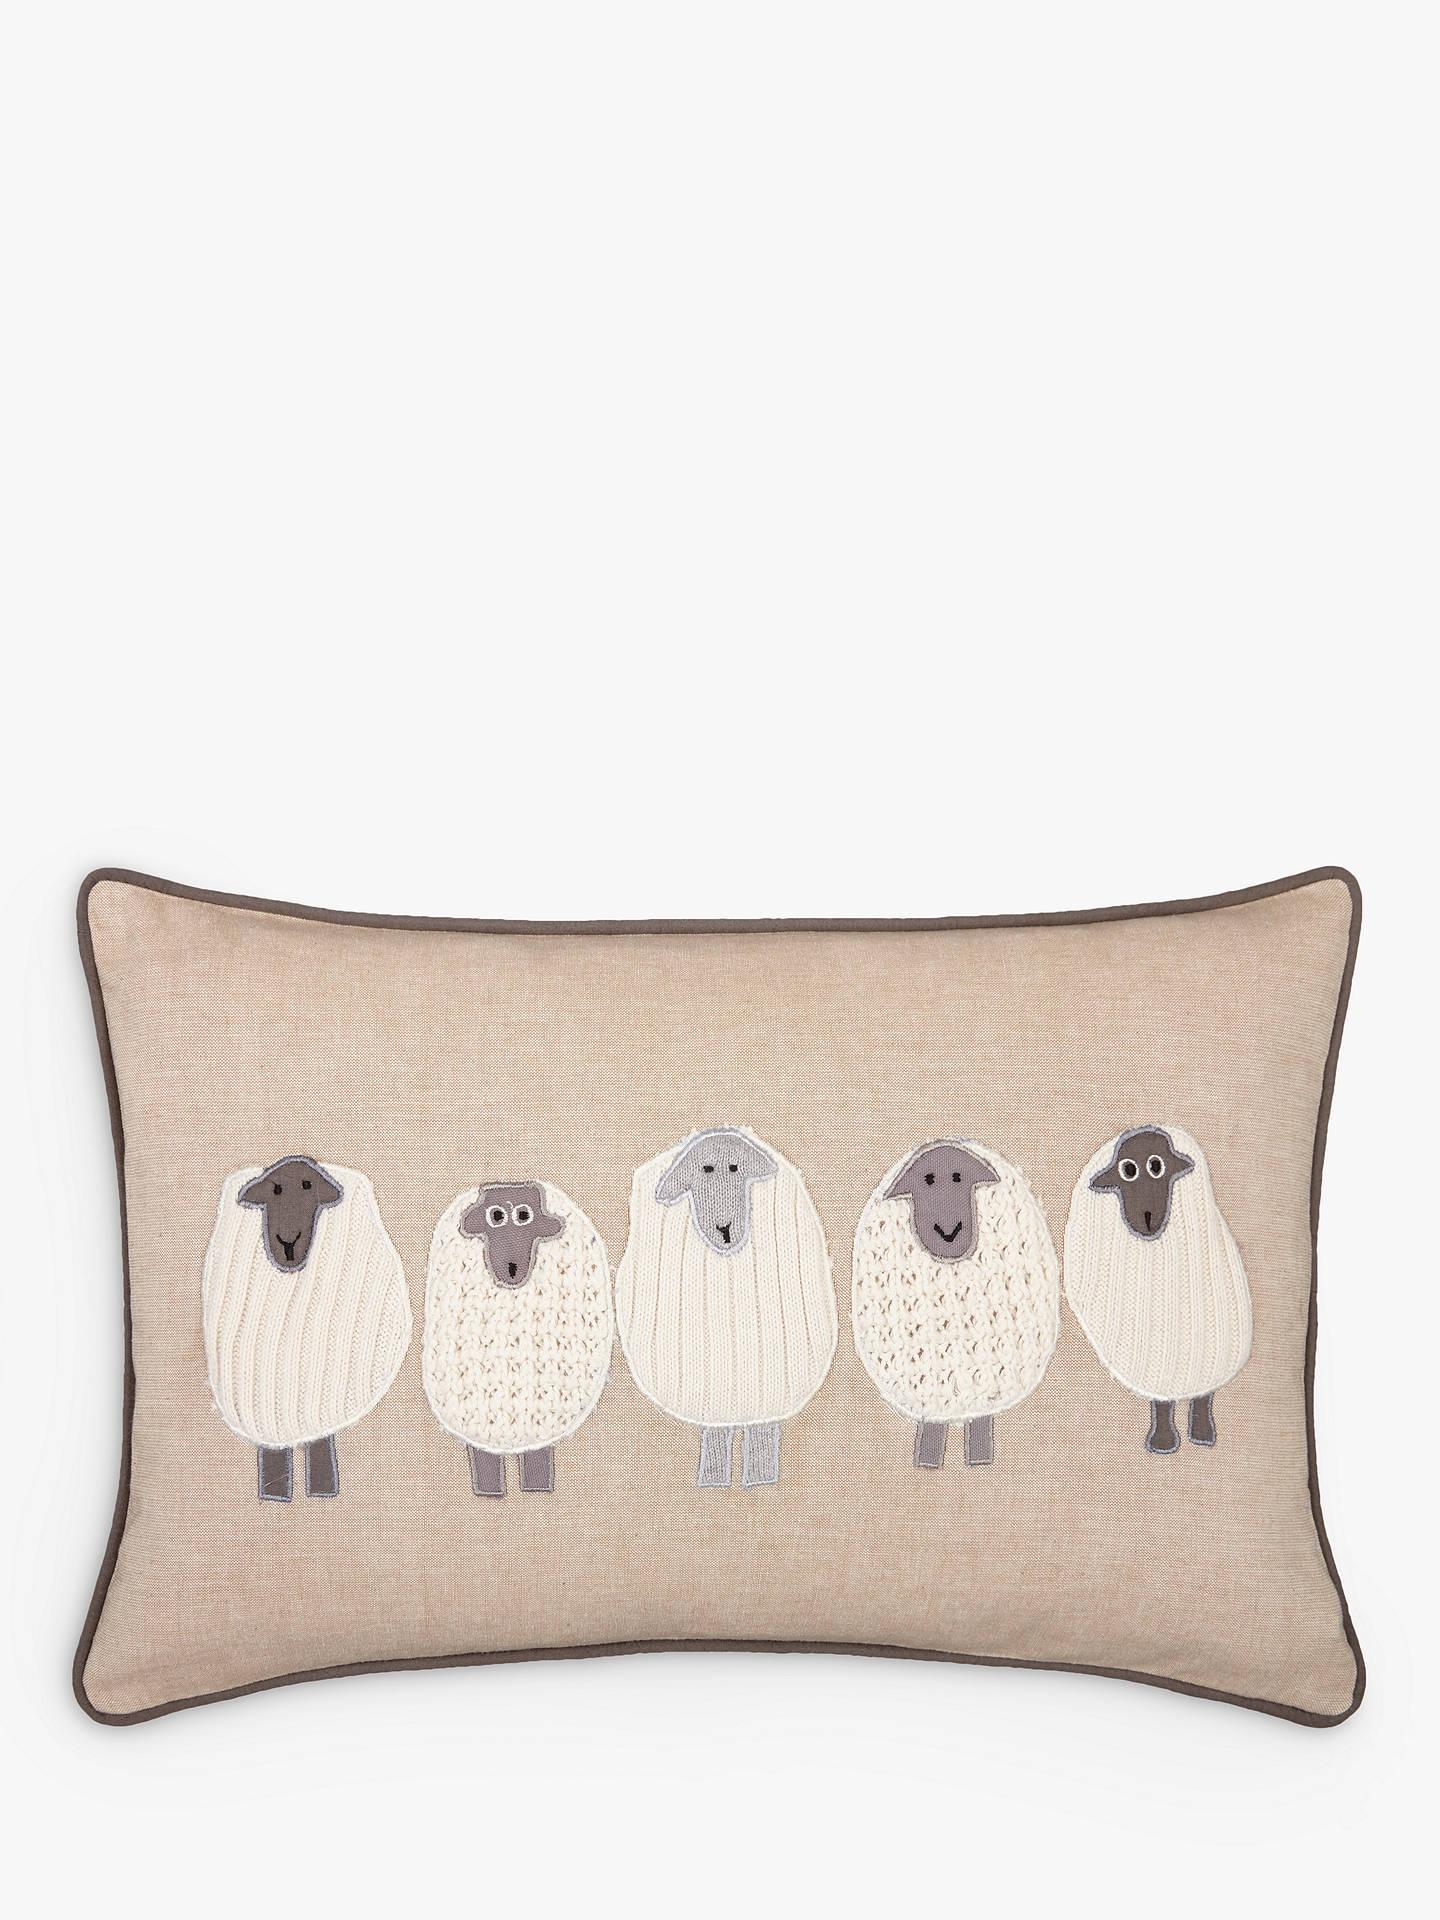 john lewis partners sheep cushion at john lewis partners. Black Bedroom Furniture Sets. Home Design Ideas